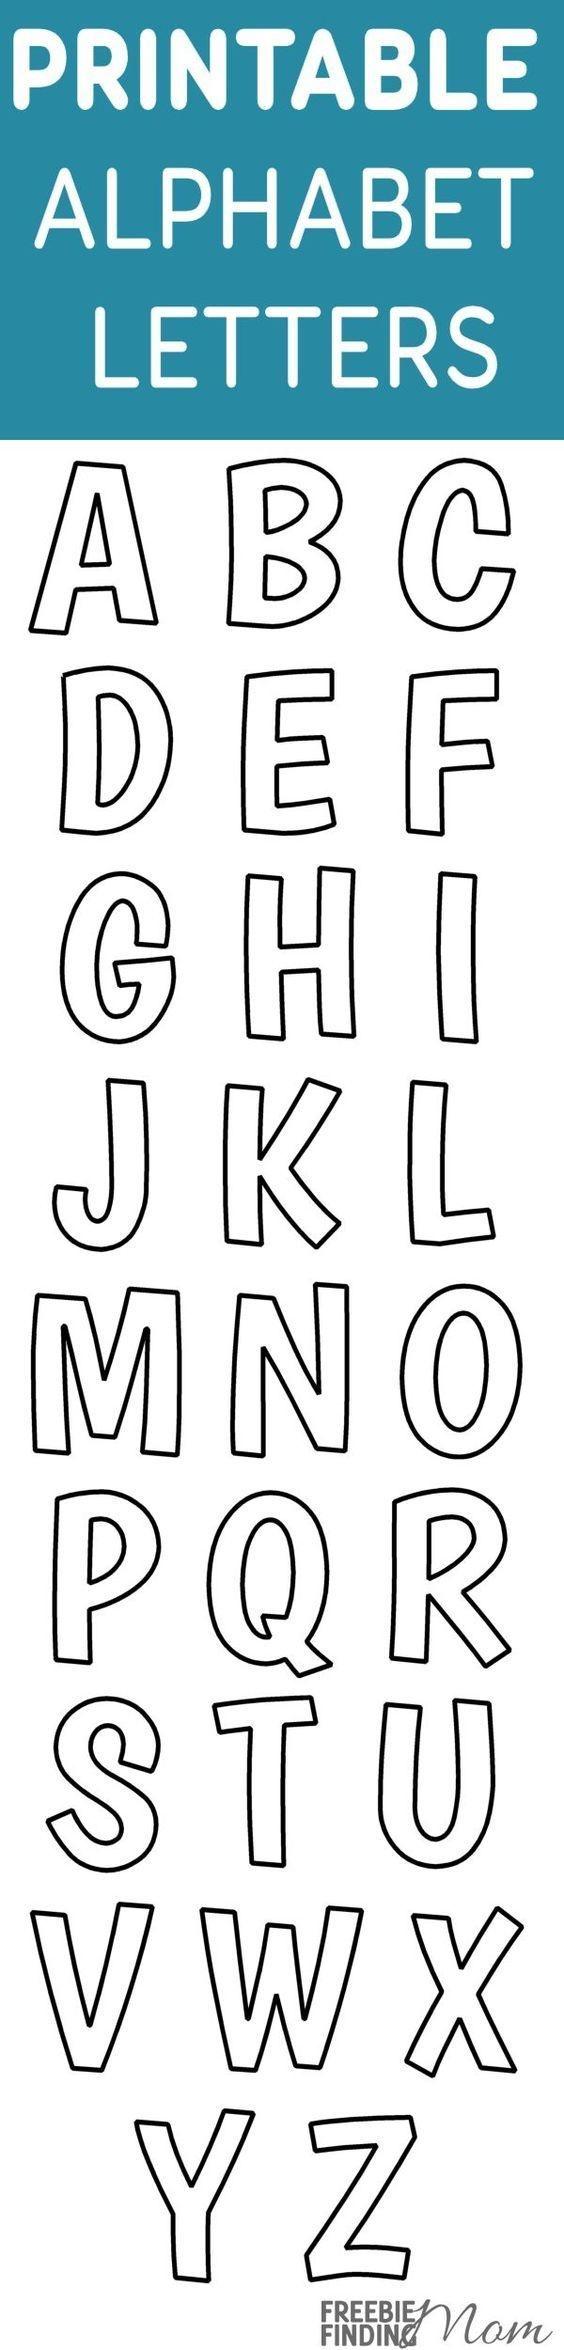 Printable Free Alphabet Templates | The Group Board On Pinterest - Free Printable Alphabet Stencils